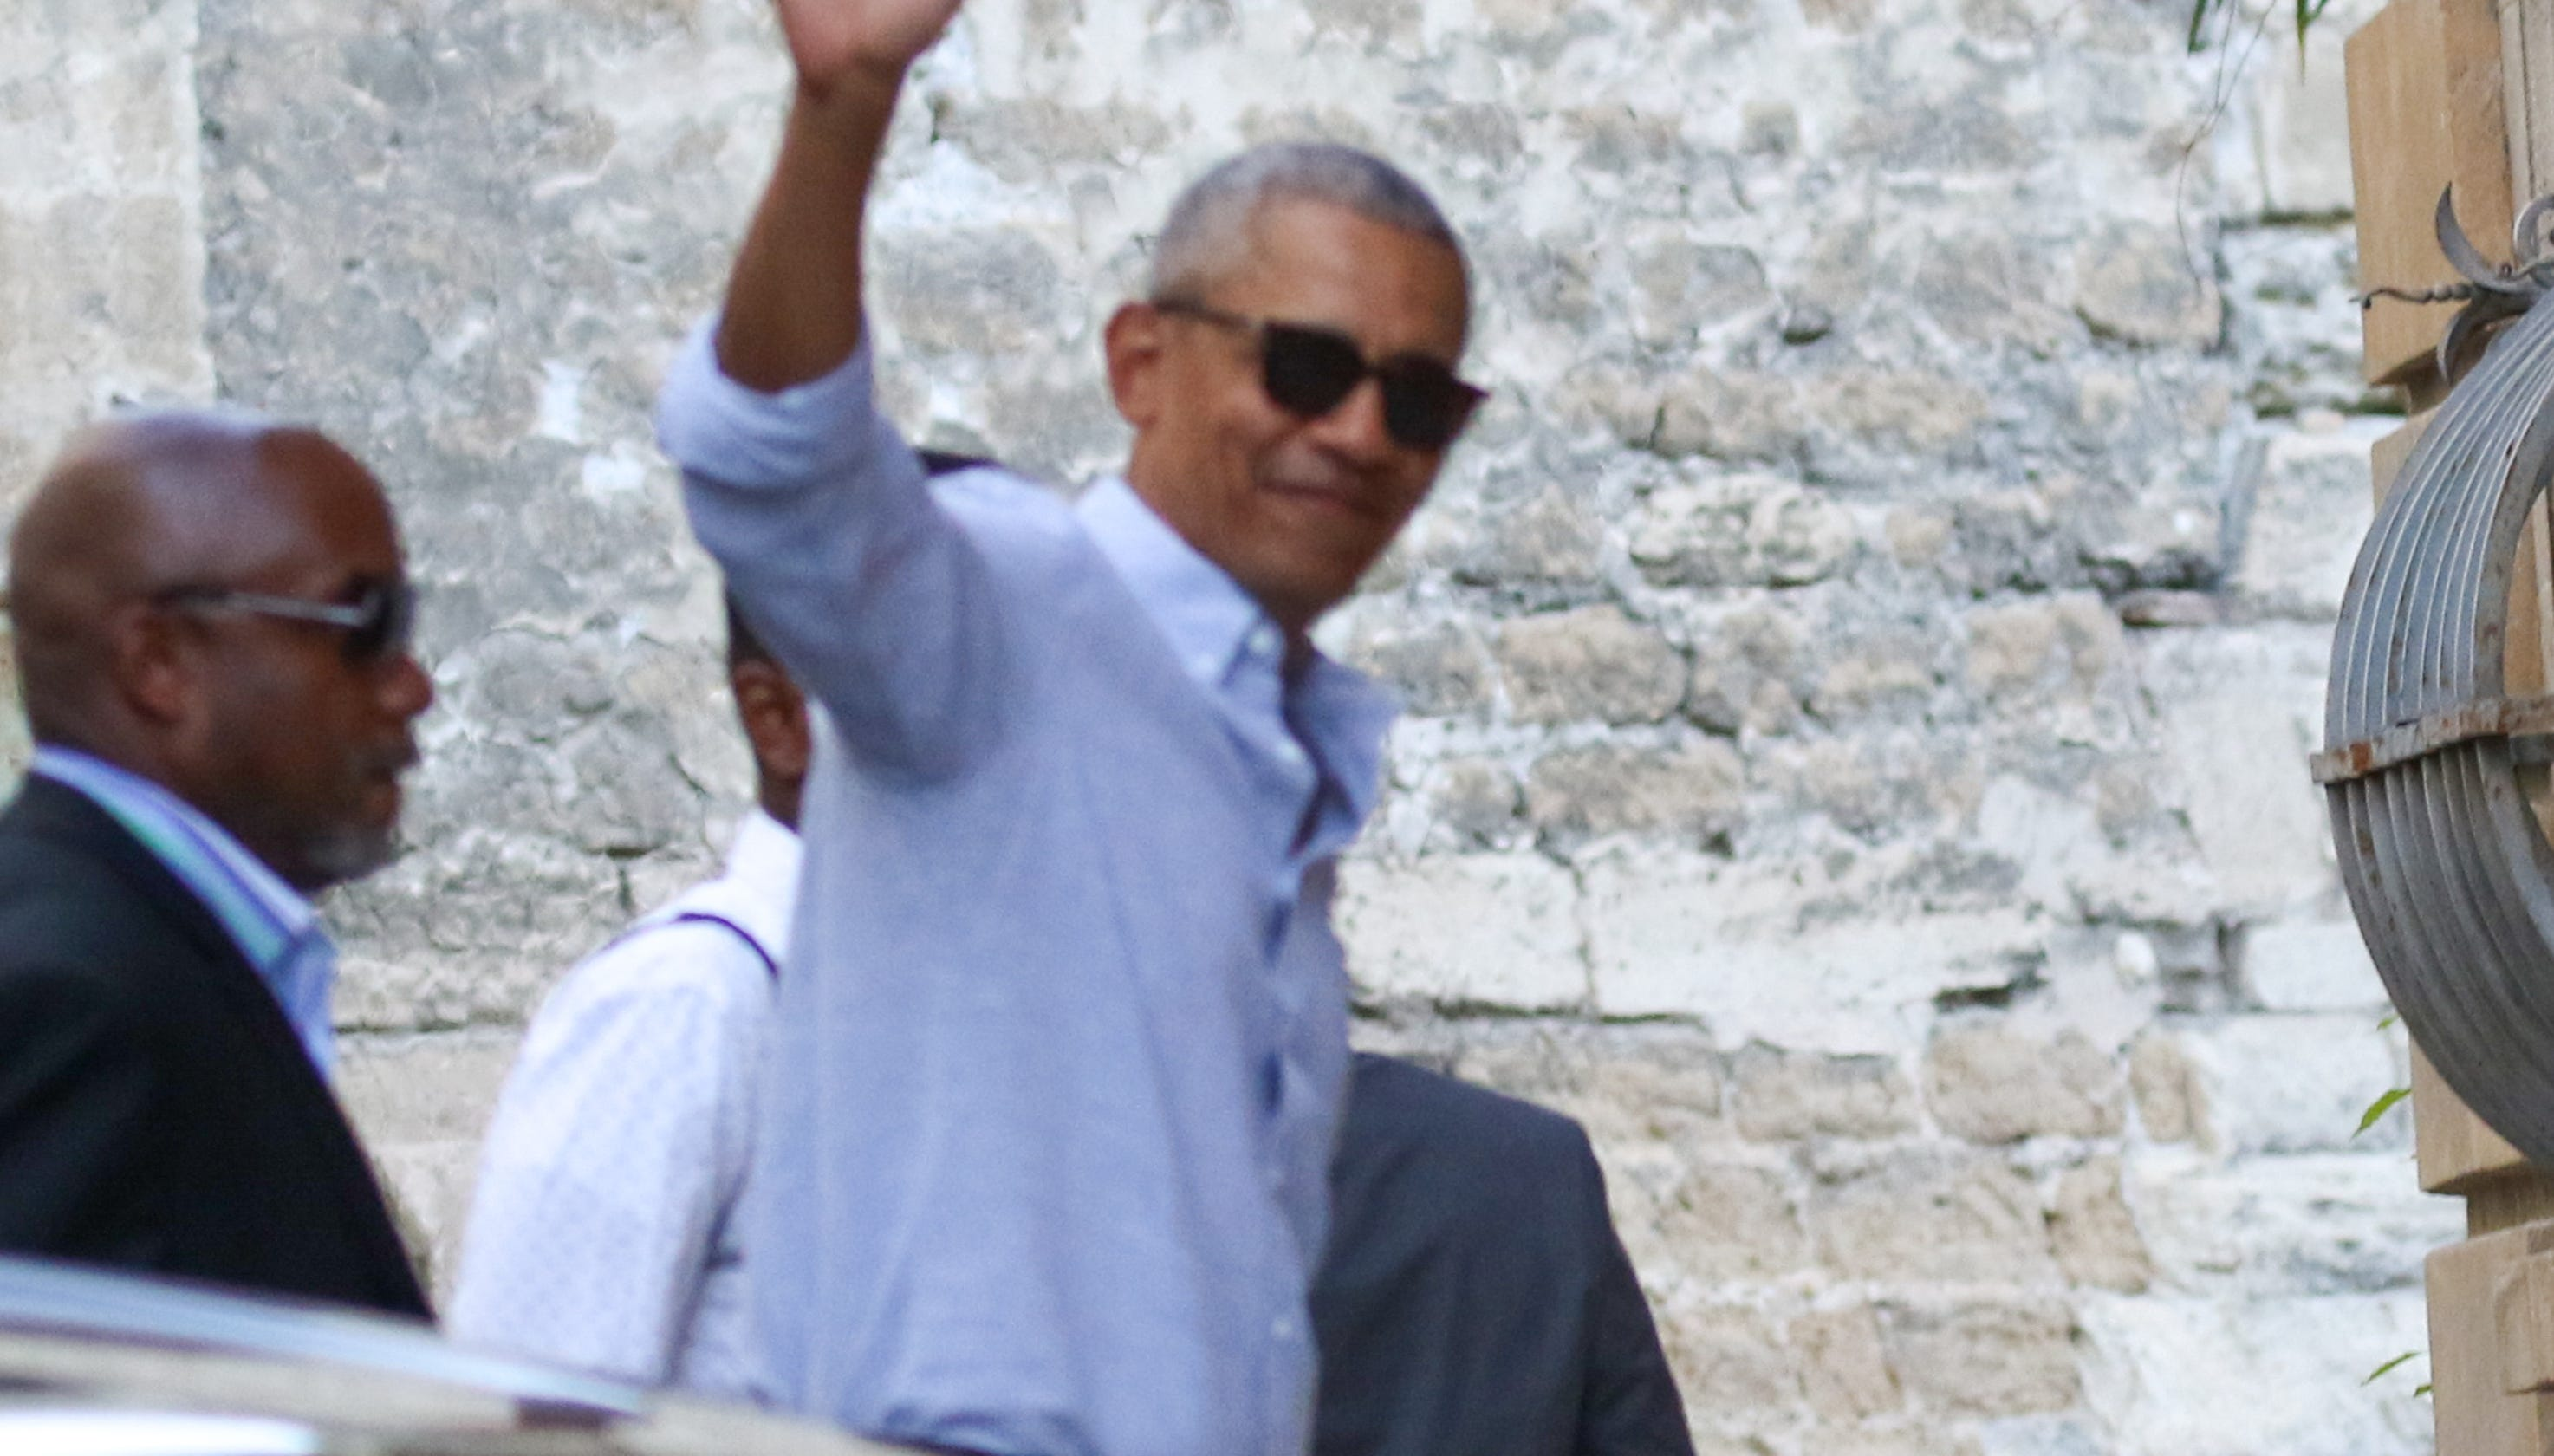 Barack Obama, Michelle, Sasha and Malia on holiday getaway in France